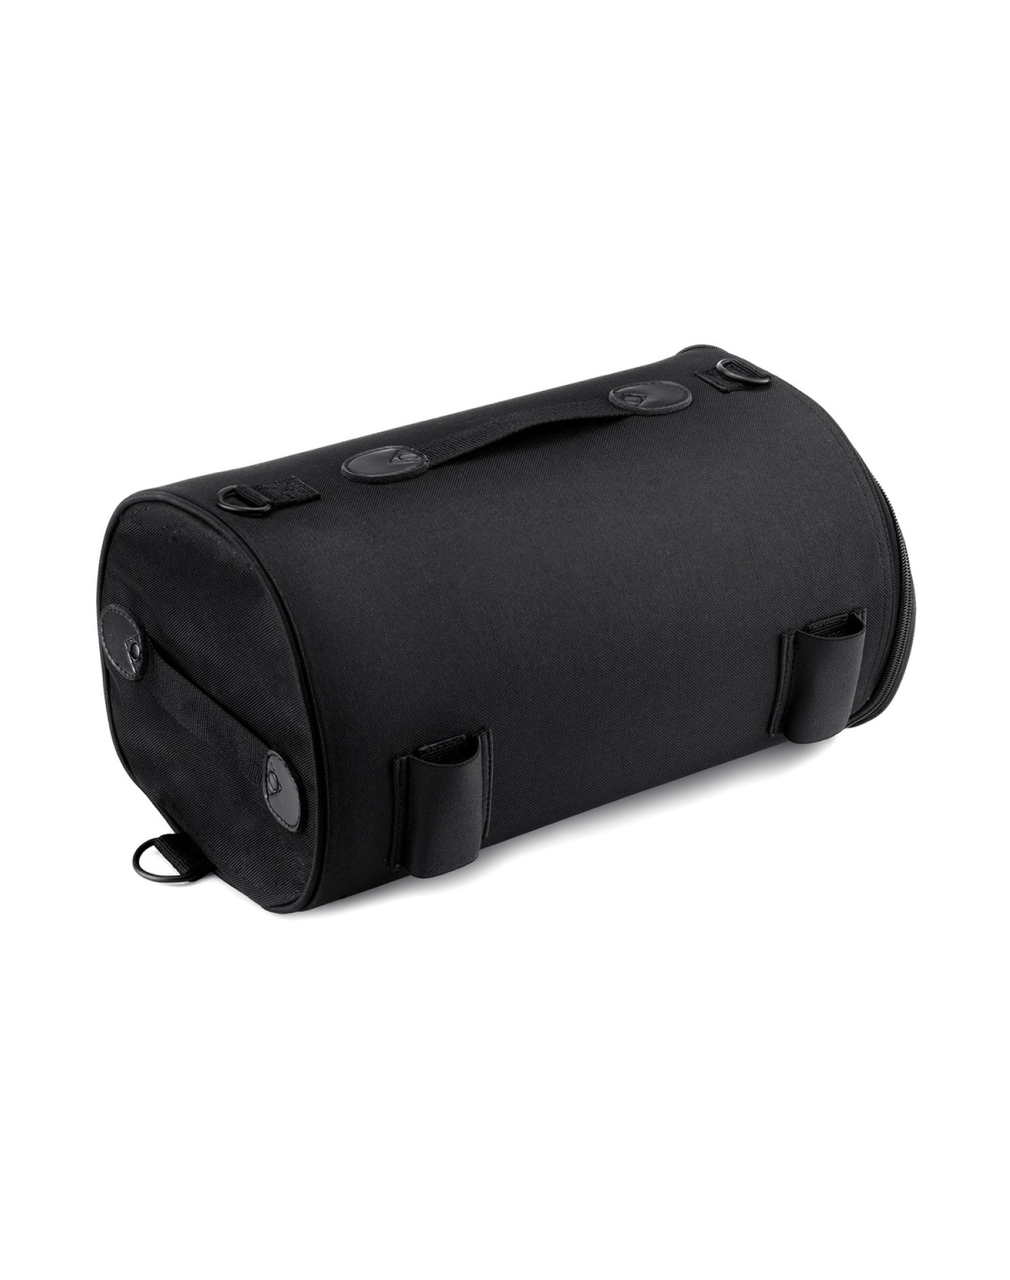 Harley Davidson Viking Extra Large Plain Motorcycle Sissy Bar Bag with  Roll Bag